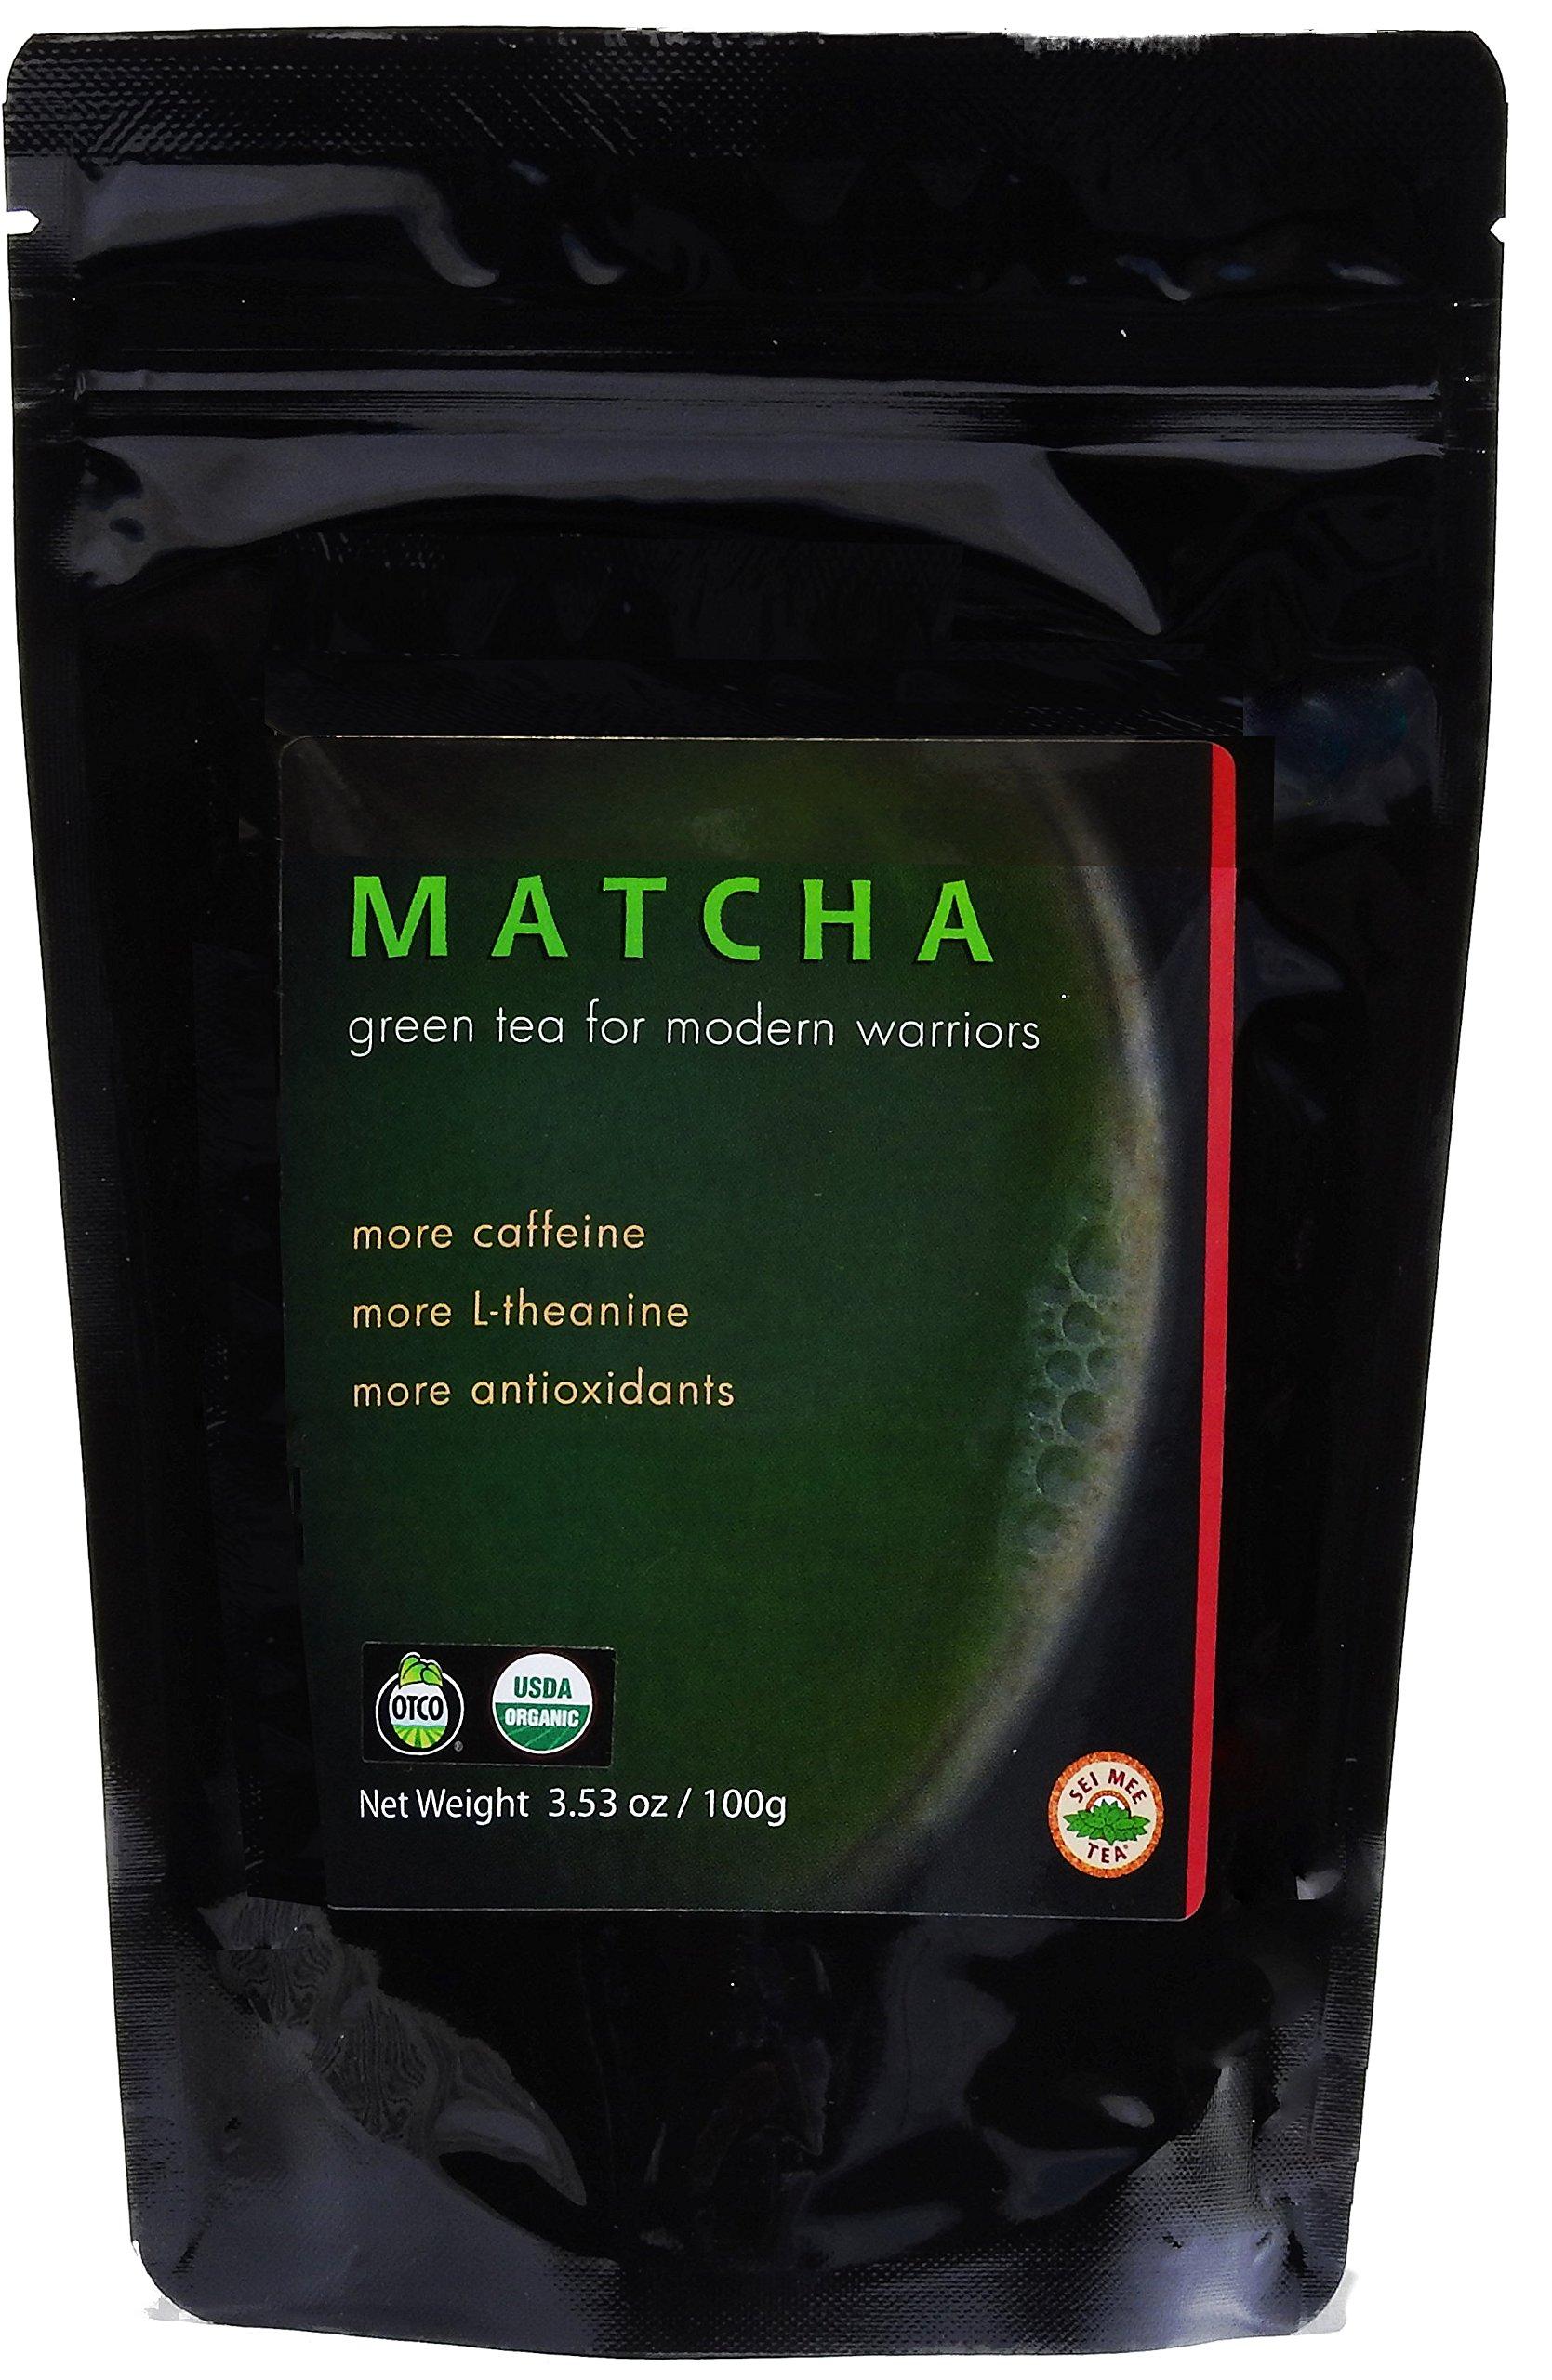 Organic Matcha Green Tea Powder (3.5 oz (100g)) in resealable pouch